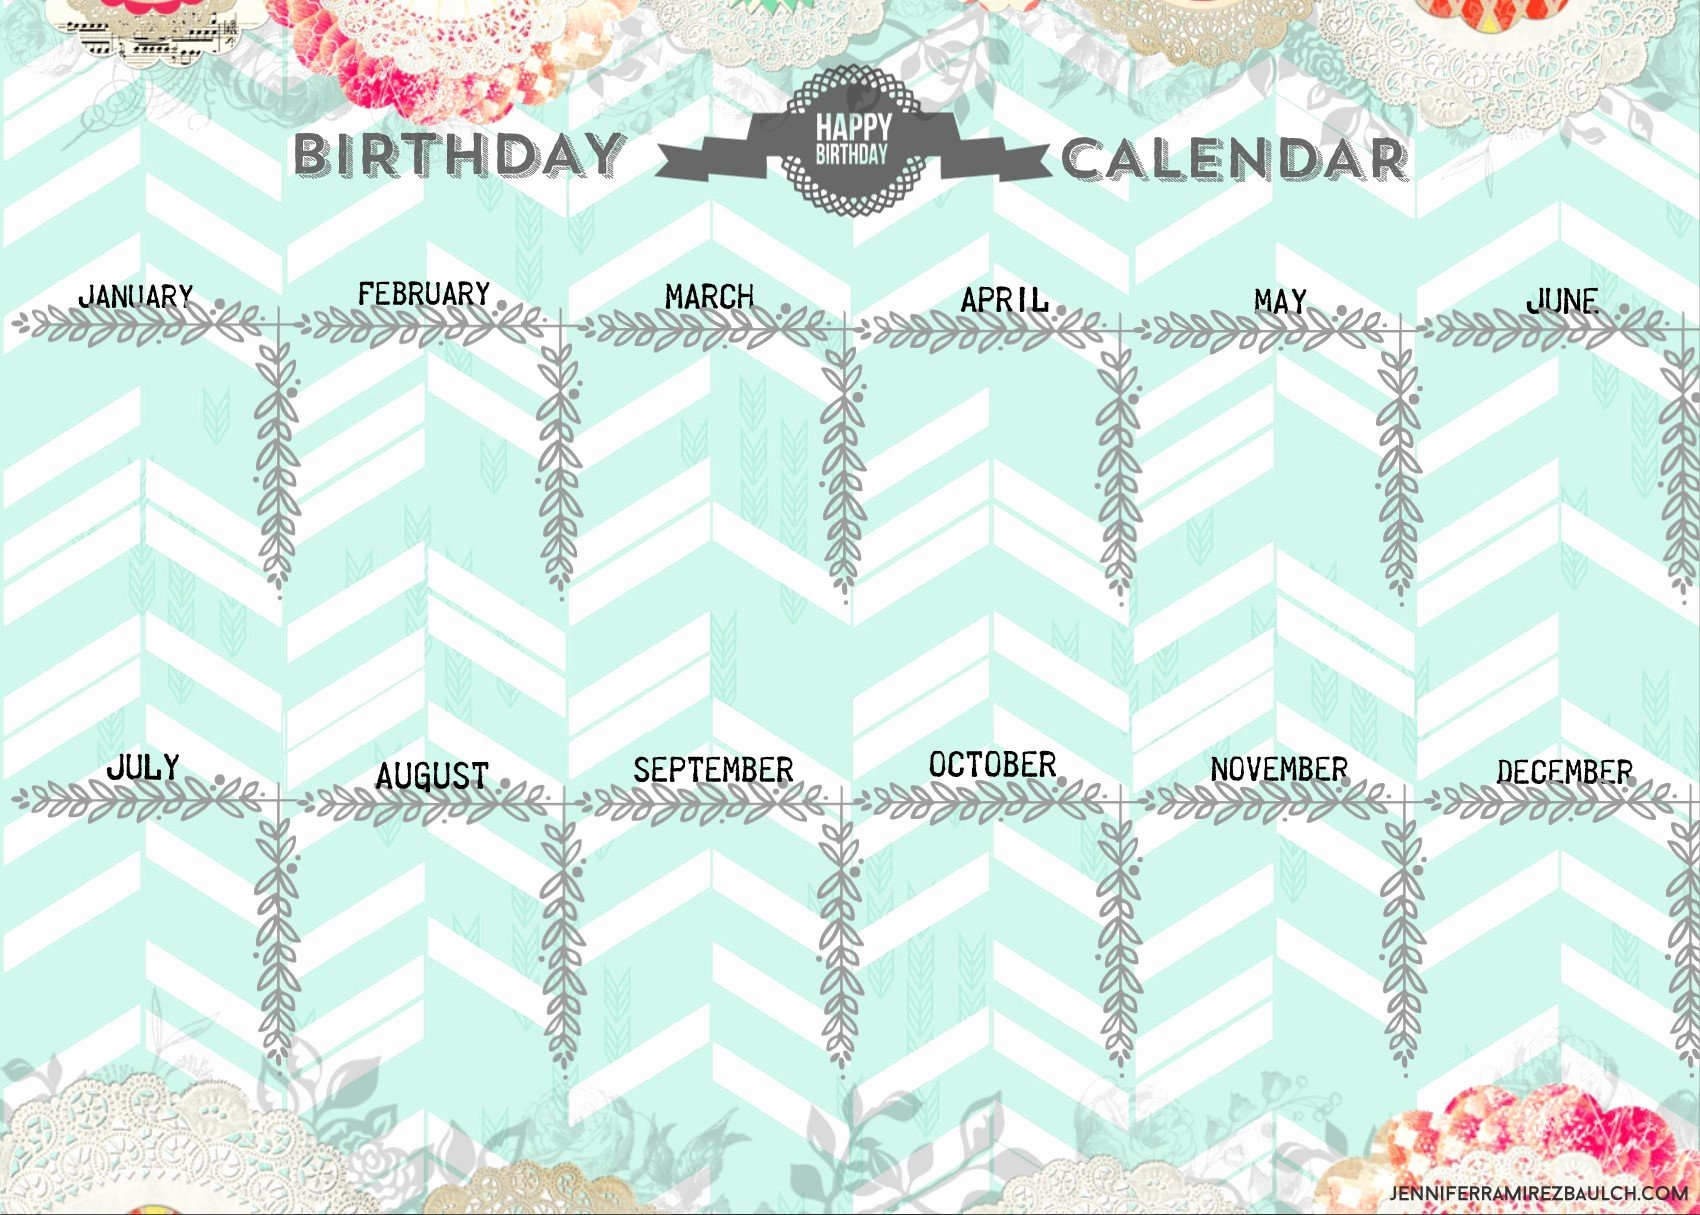 Free Printable Perpetual Calendar Fresh Free Printable Perpetual Calendar Planner Vintage Style